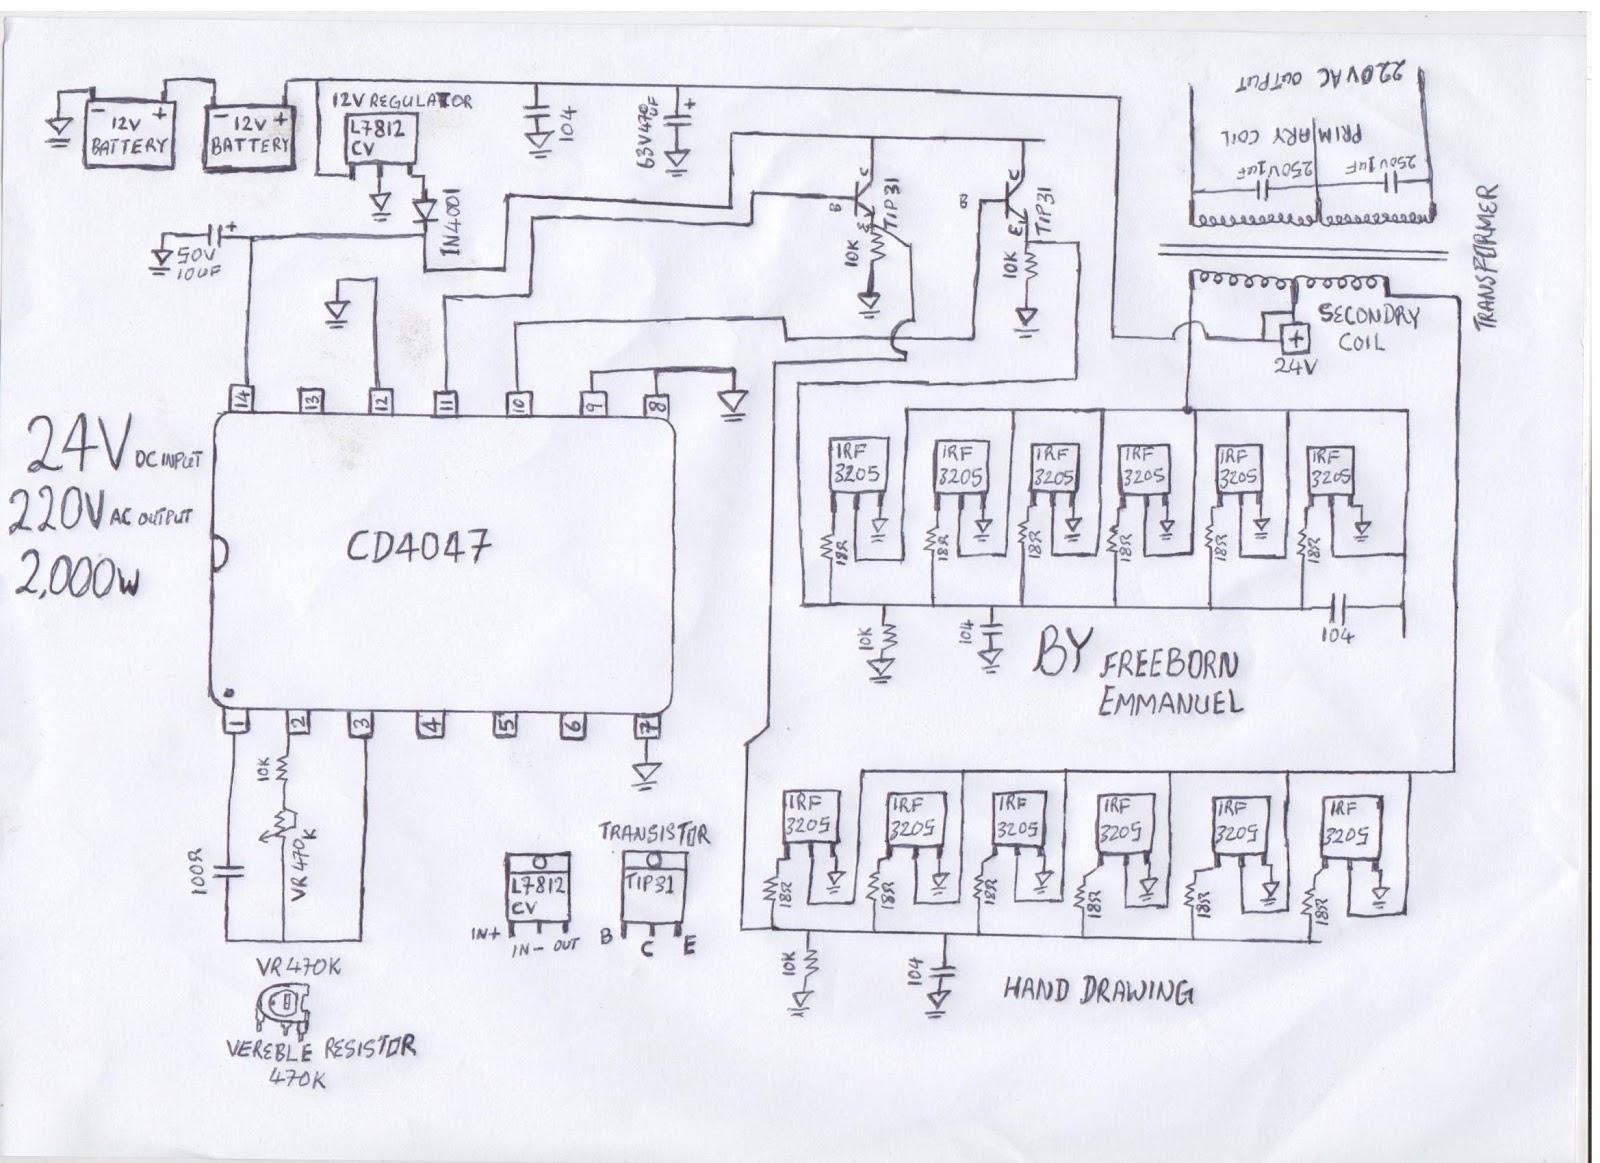 inverter circuit diagram 2000w [ 1600 x 1163 Pixel ]